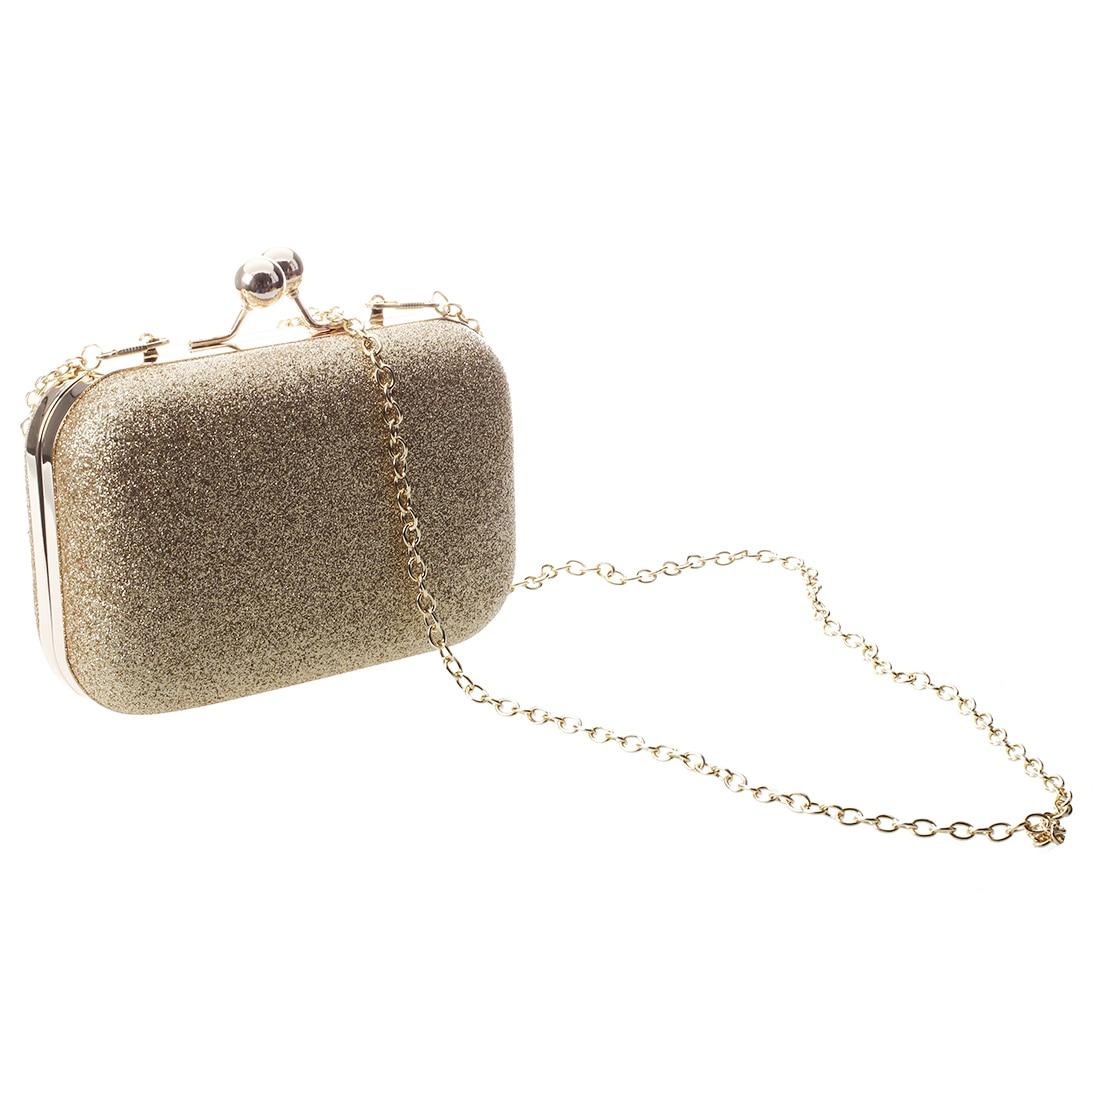 5pcs of  Clutch Hand Shoulder Bag Women PU Leather Shoulder Bag Gold 5 pcs of p